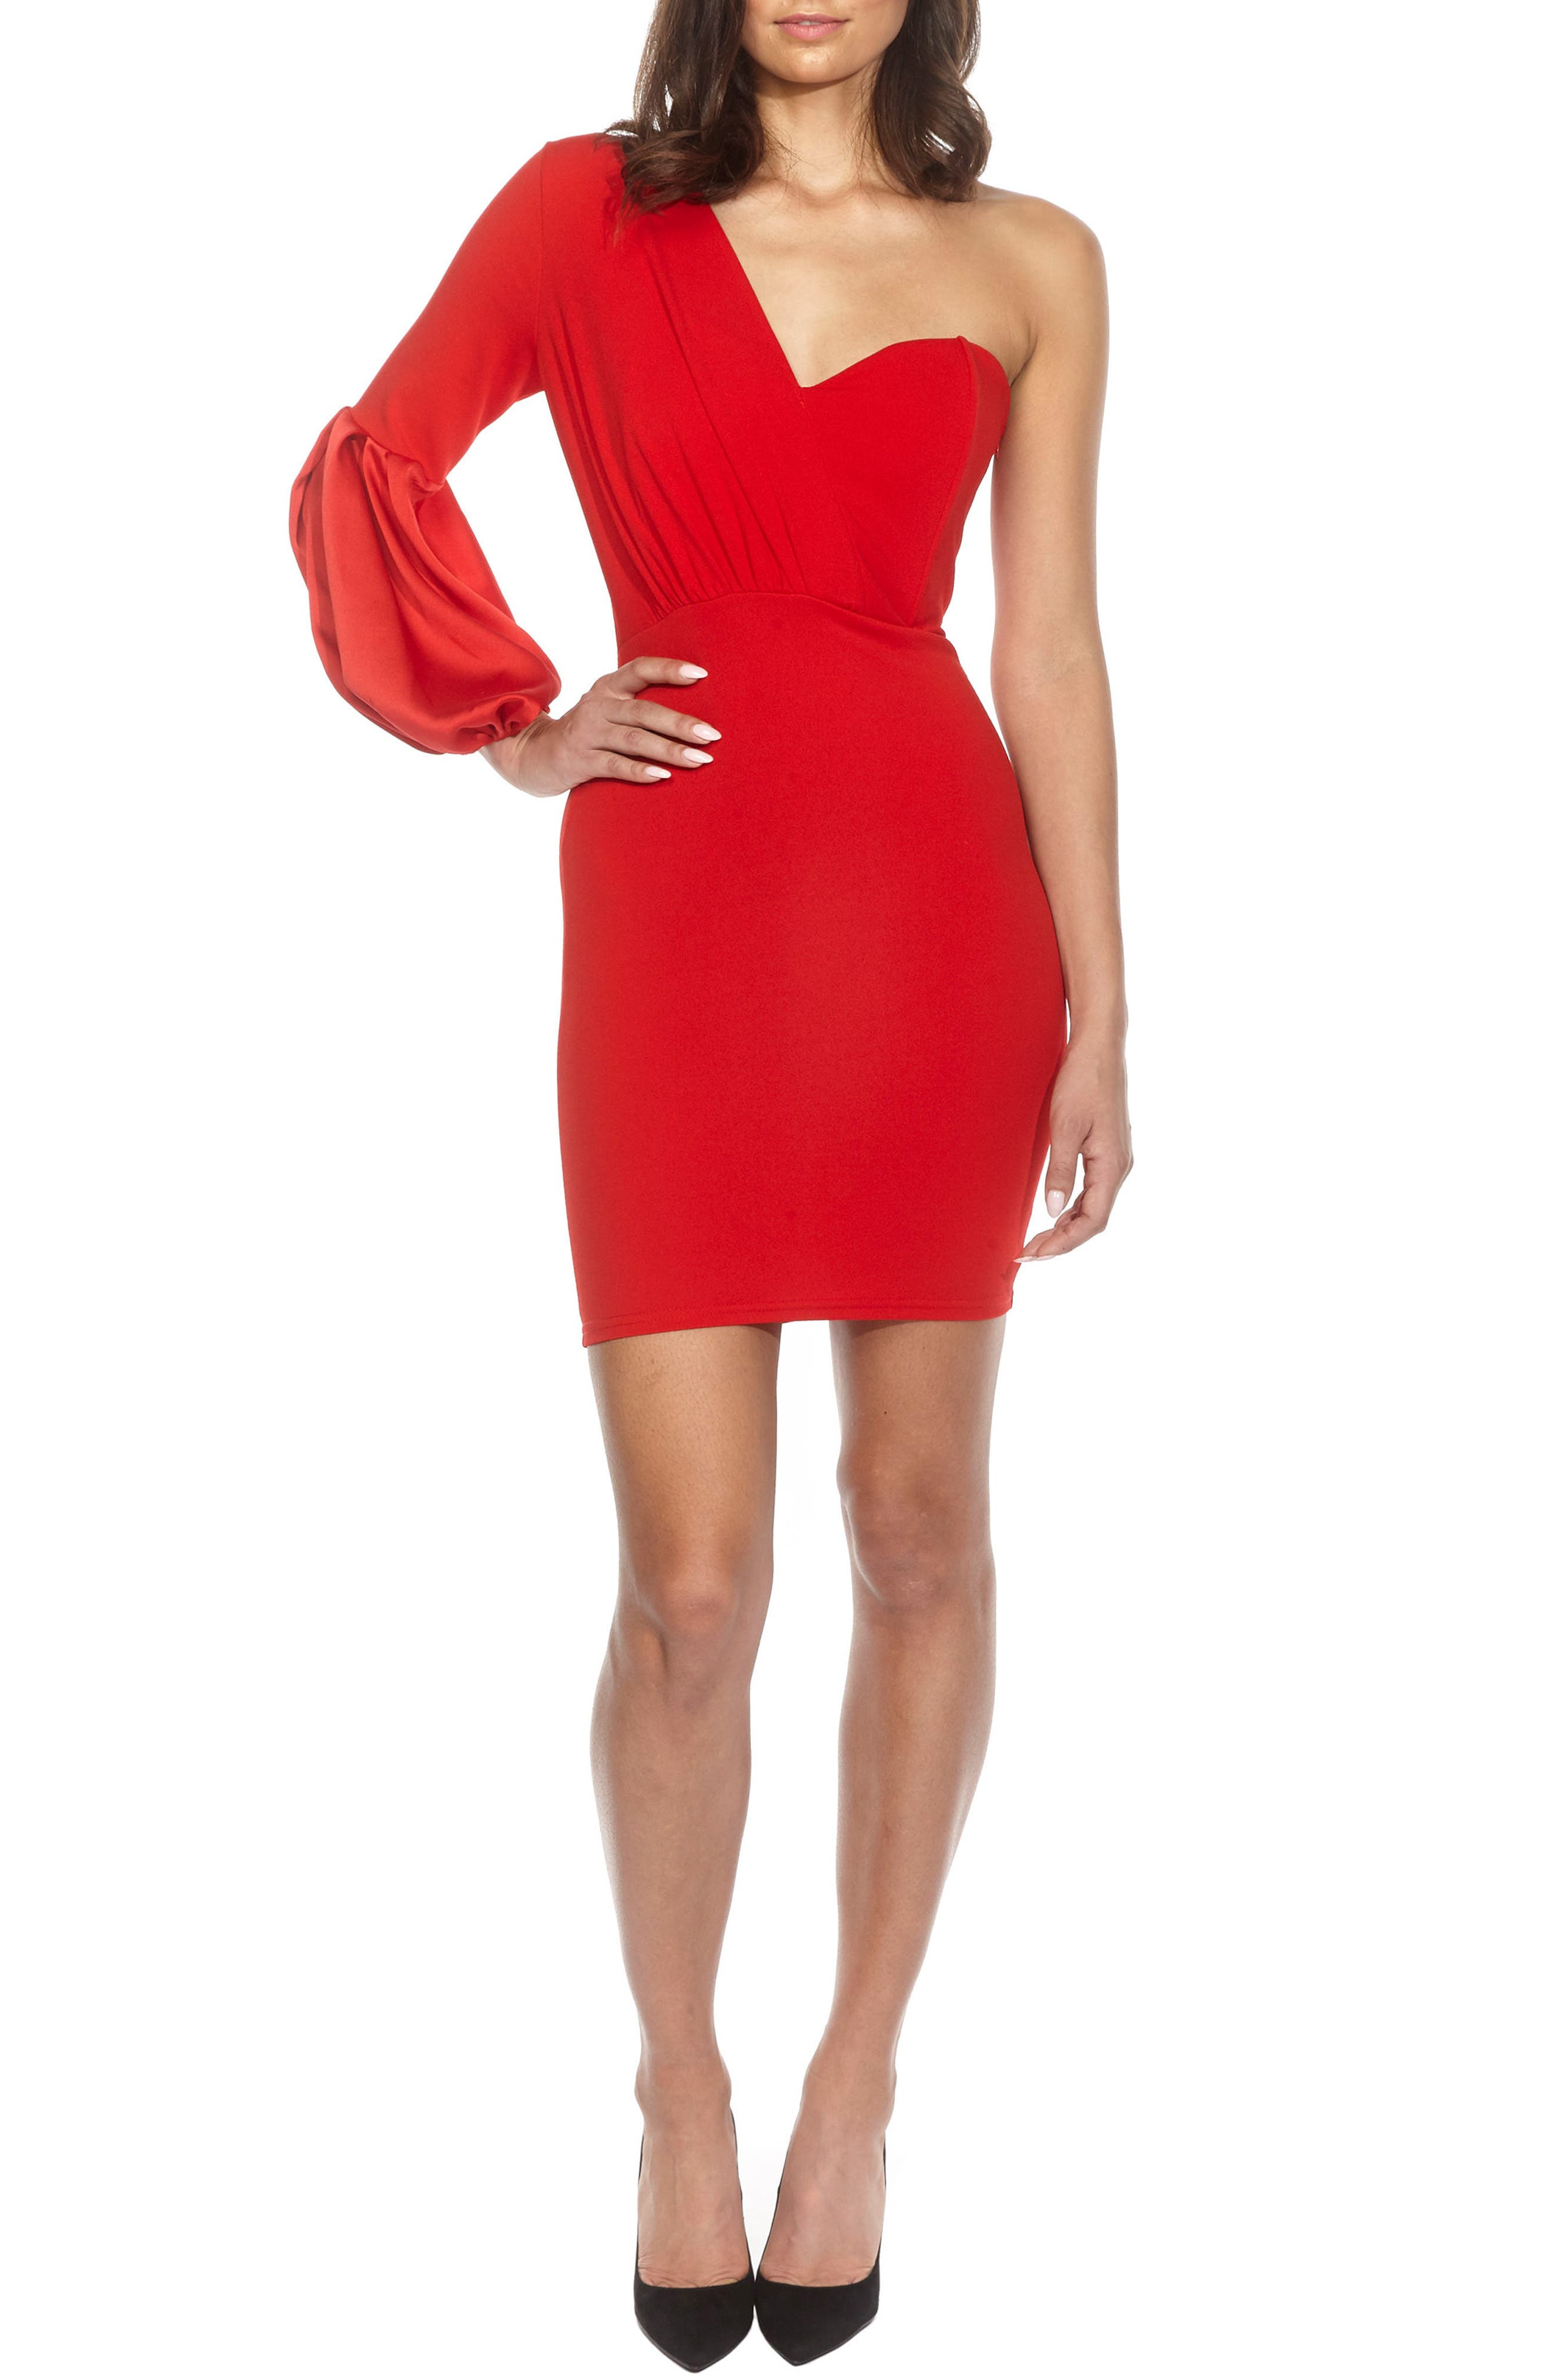 Alternate Image 1 Selected - TFNC Naeva One-Shoulder Minidress